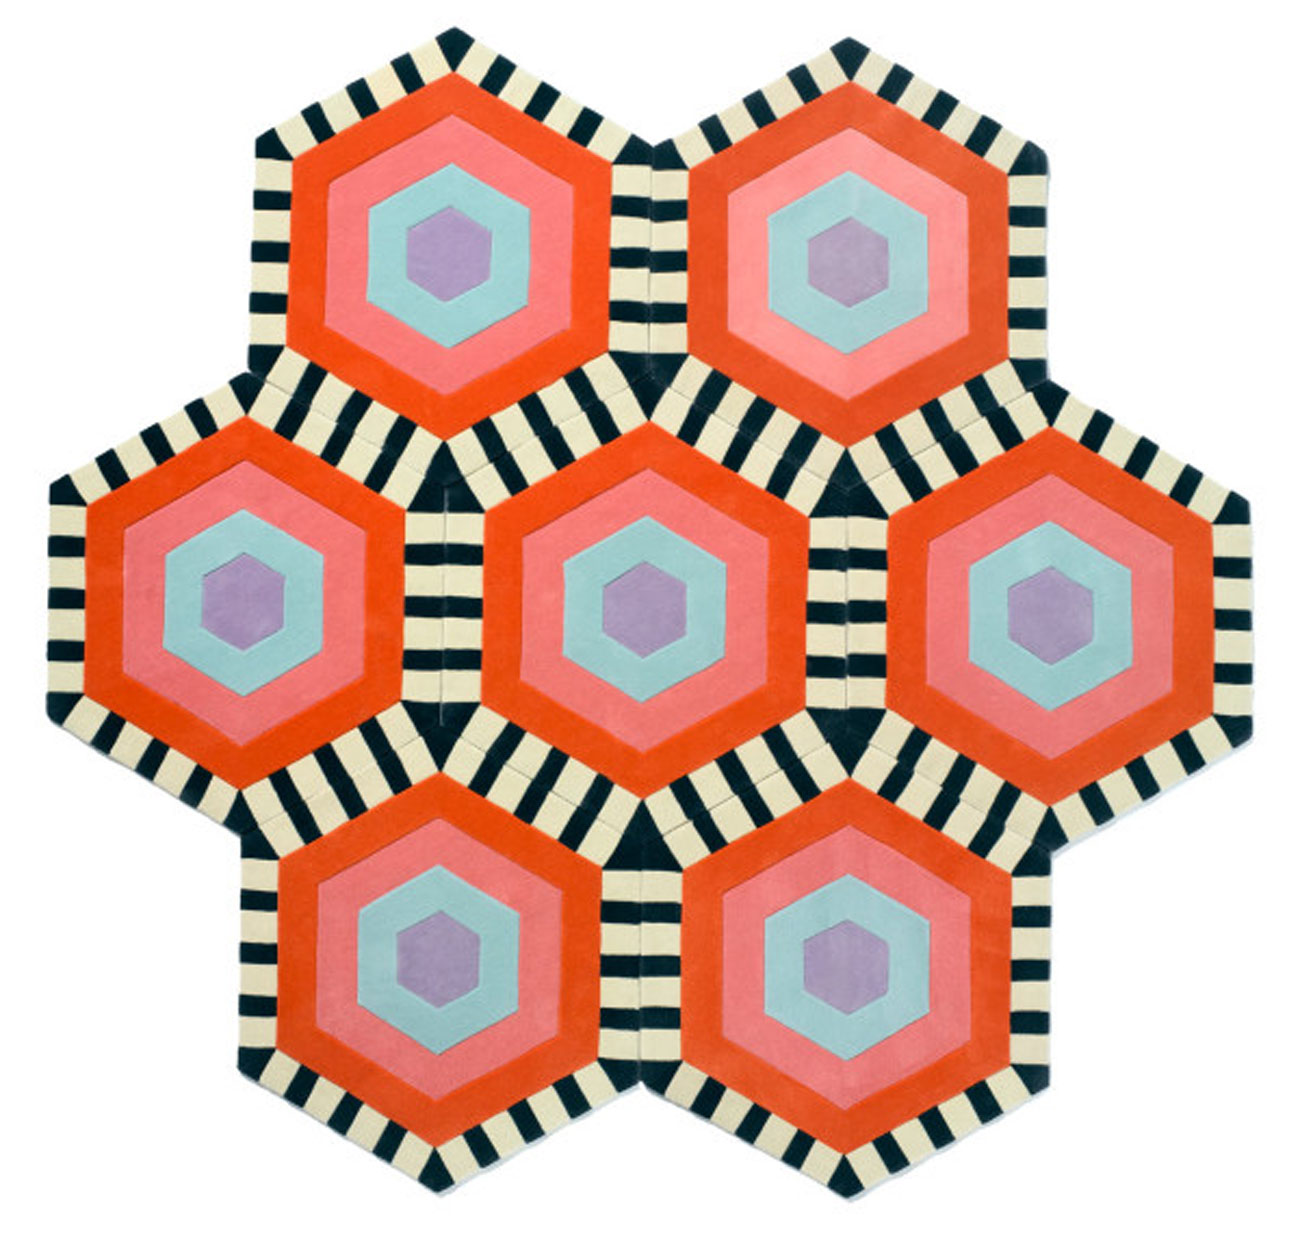 kinder ground modular carpet